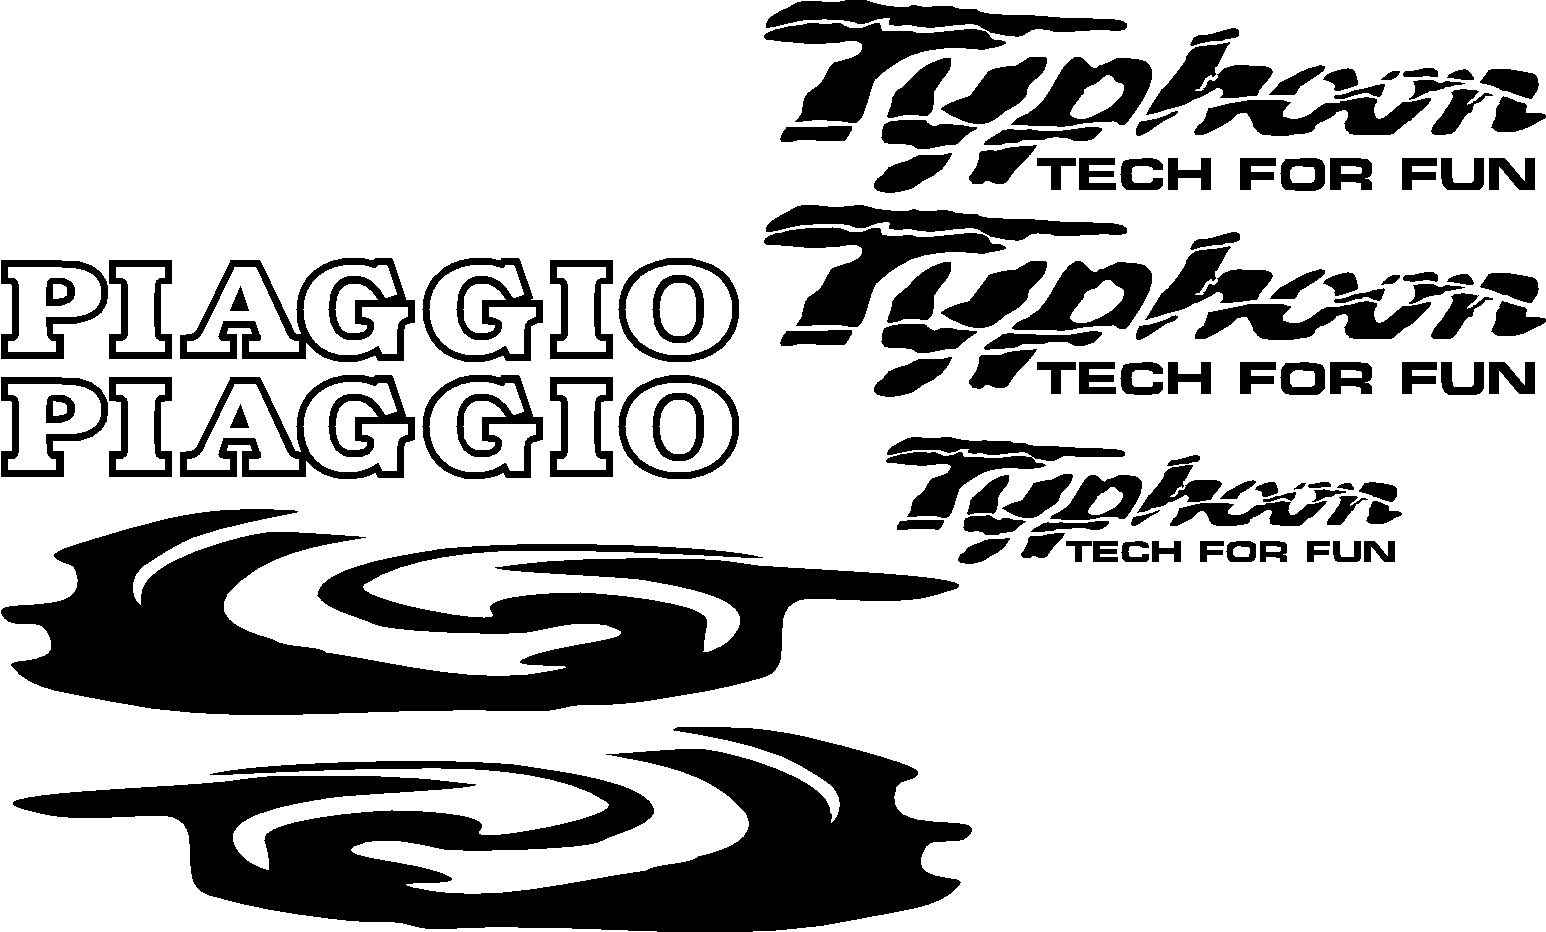 Для Piaggio Typhoon Tech для Забавный роллер мопед наклейки графика